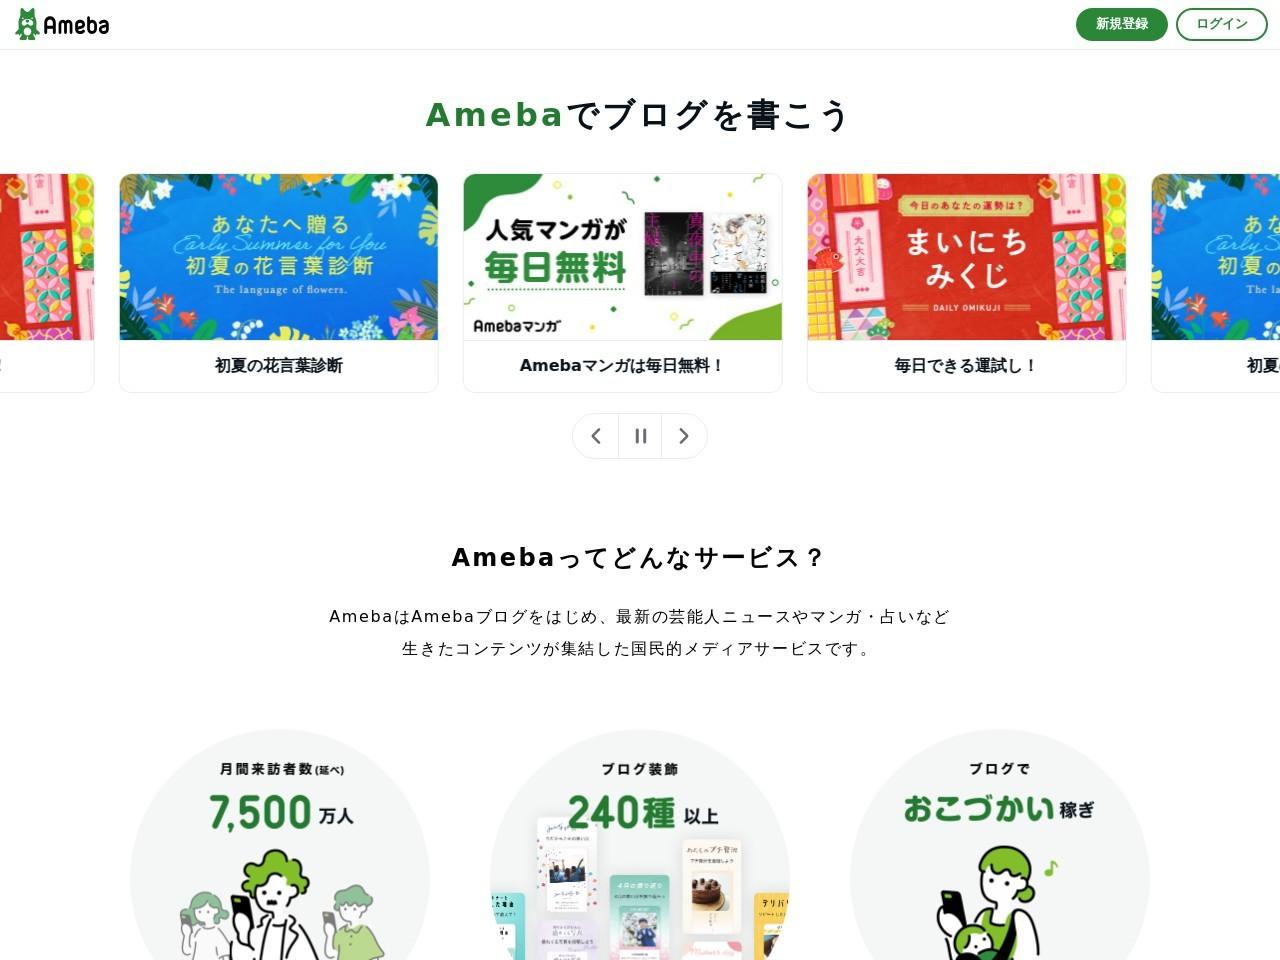 Webthumbnail ameblo.jp